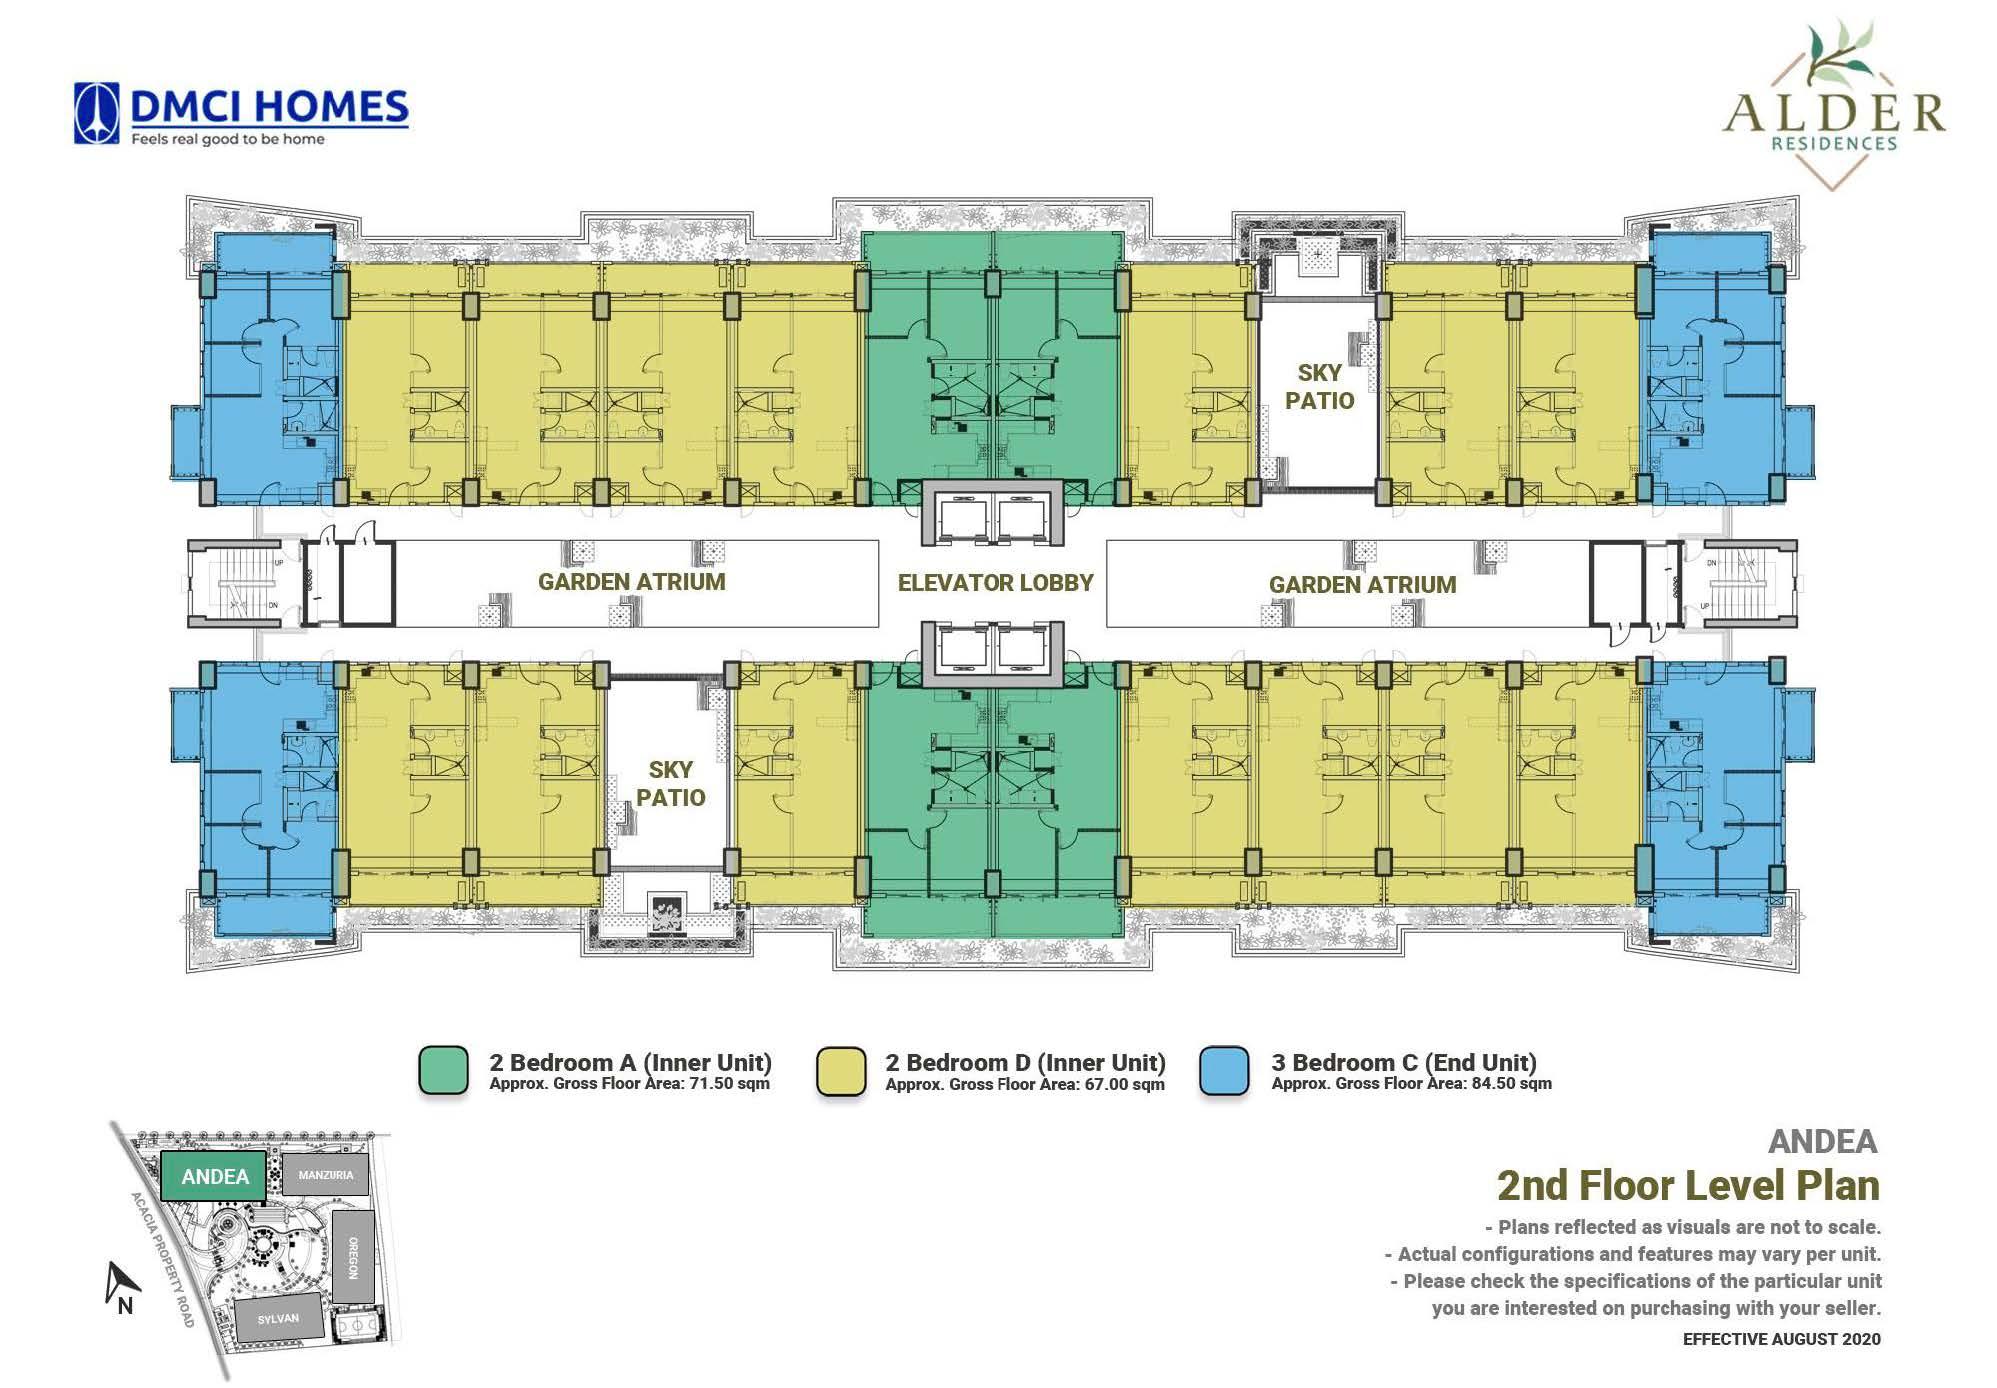 2nd Level Floor Plan